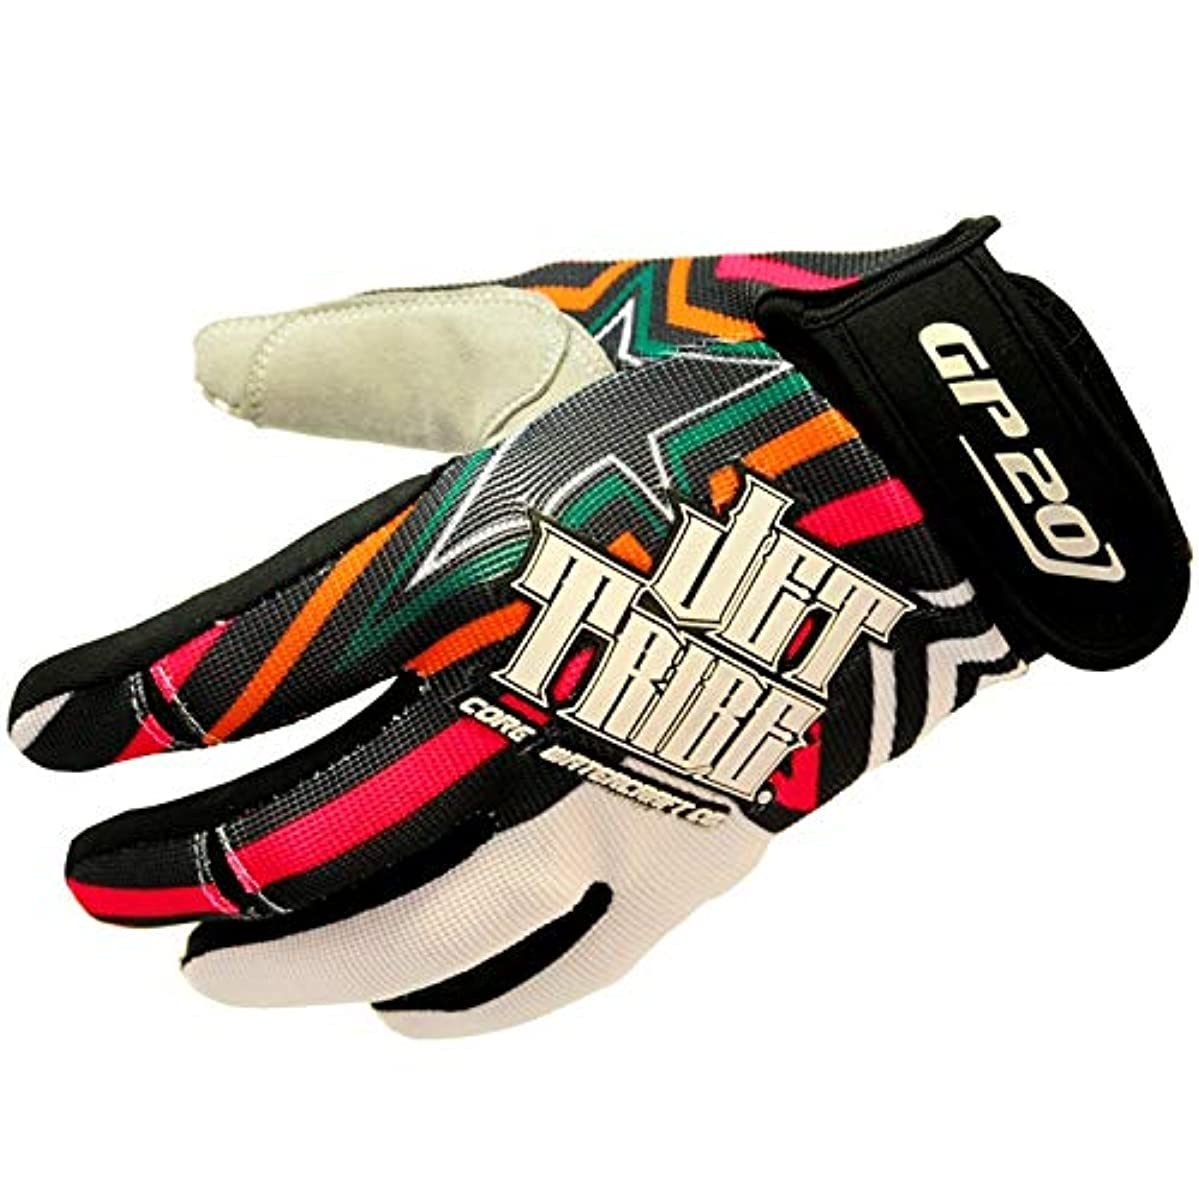 GP-20 Jetski Gloves Watersports Pro Racing Jet Ski Recreation